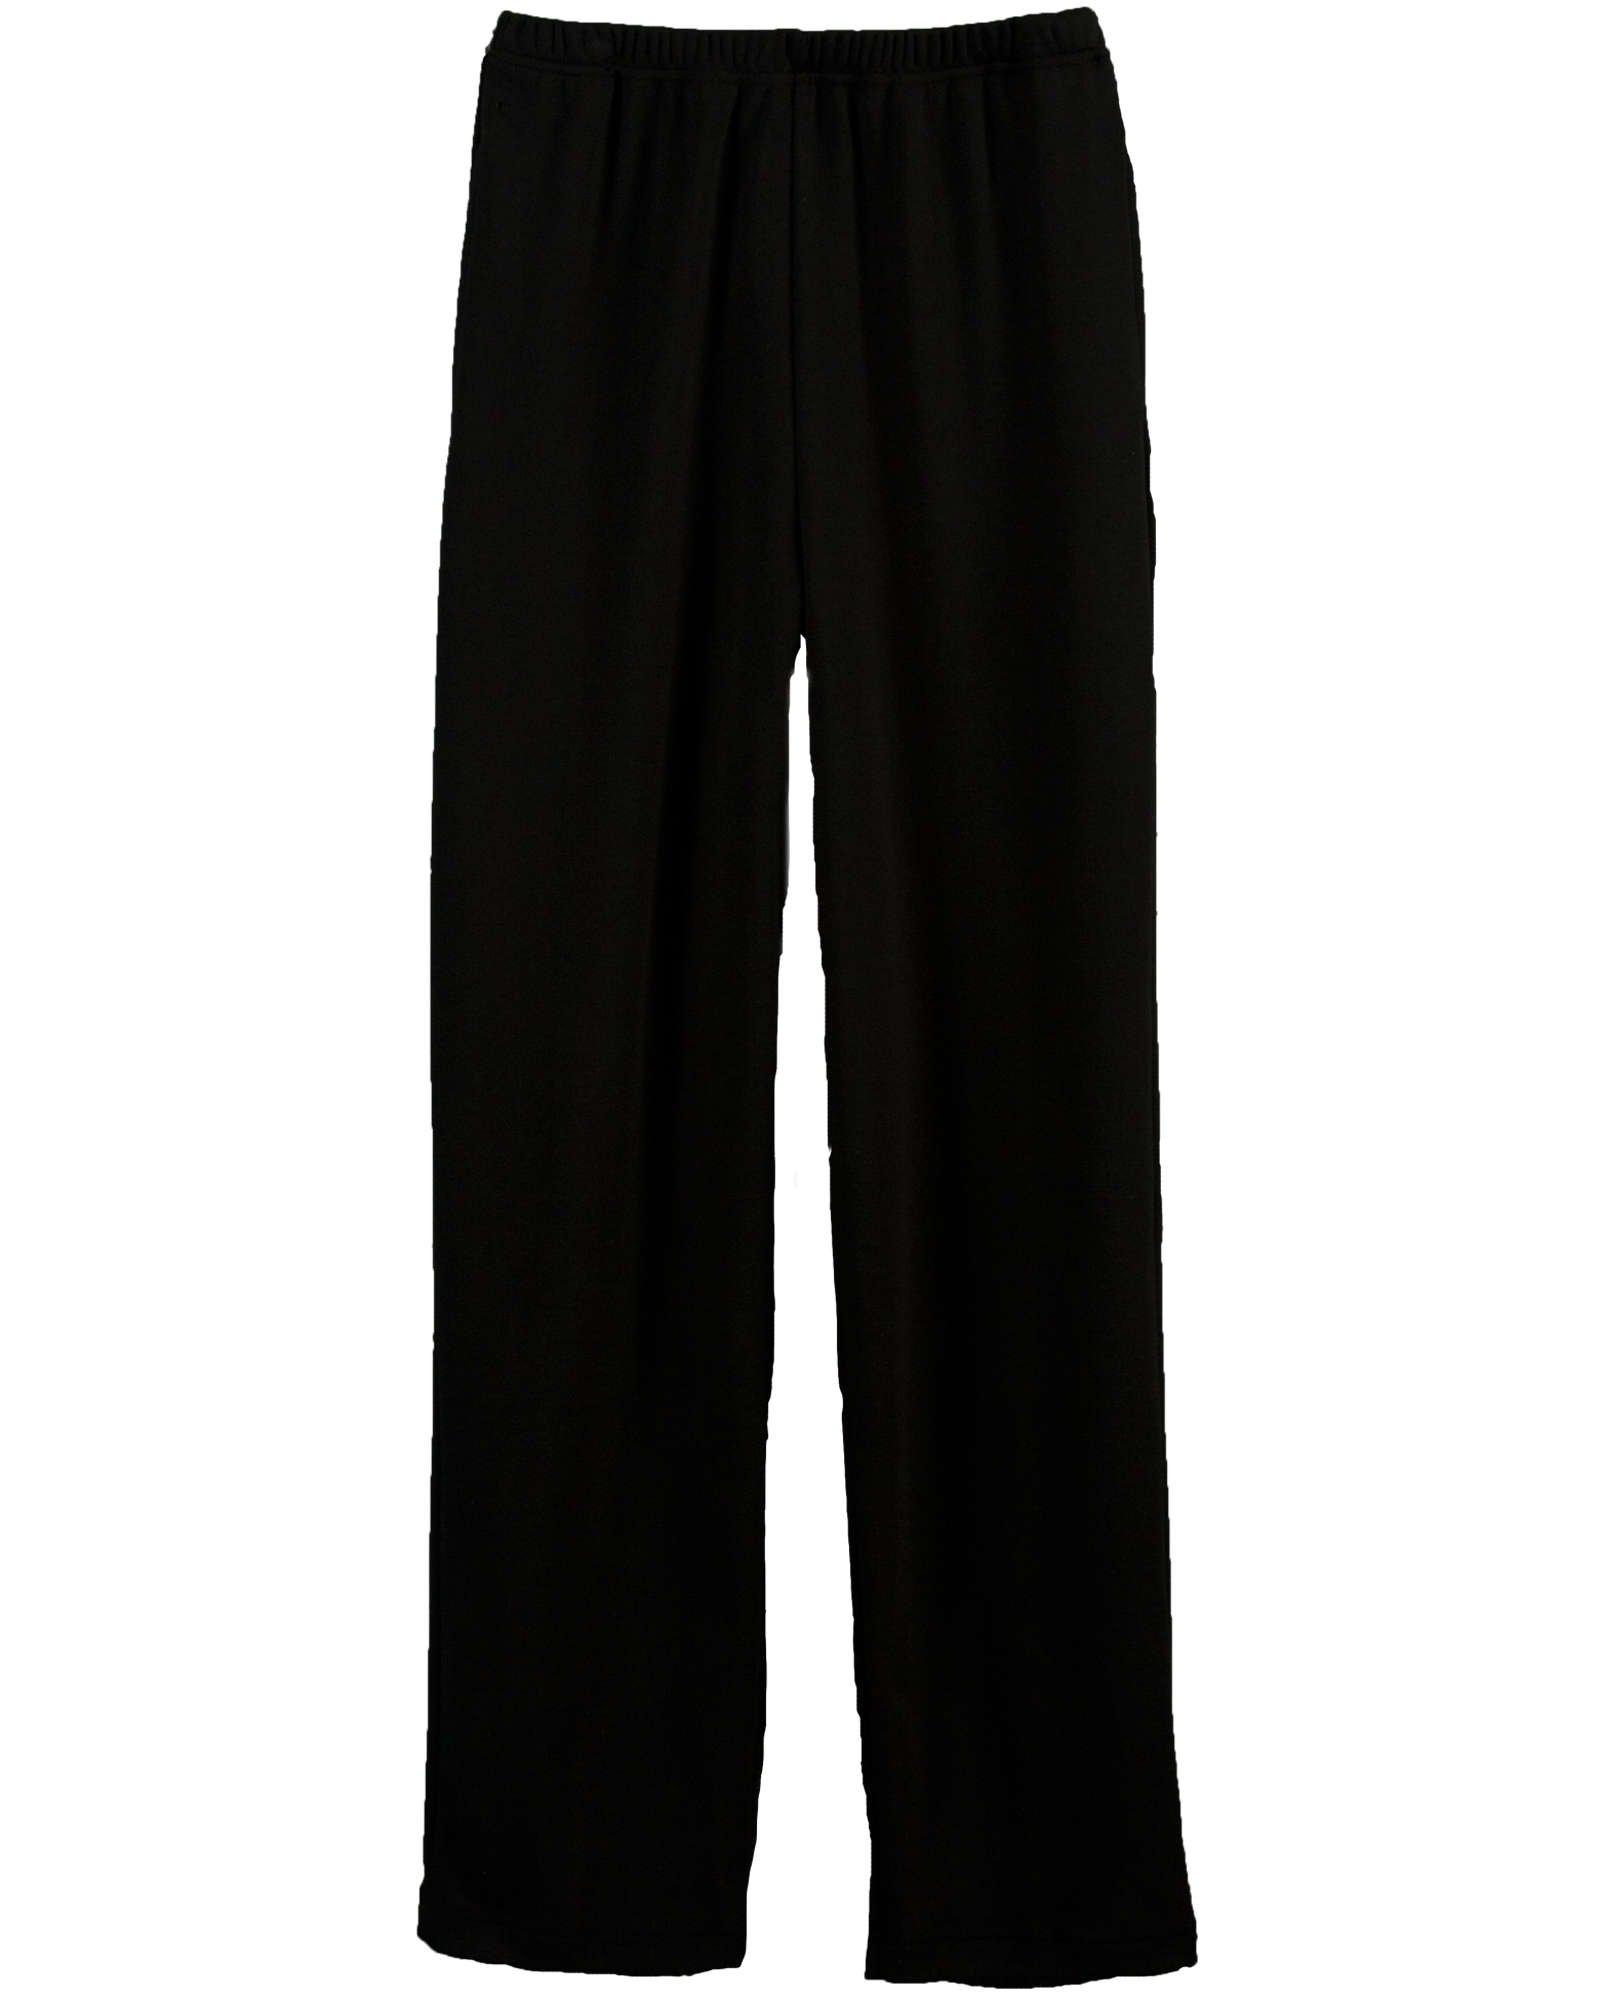 UltraSofts Elastic-Waist Interlock Pull-On Pants, Black, Petite XL